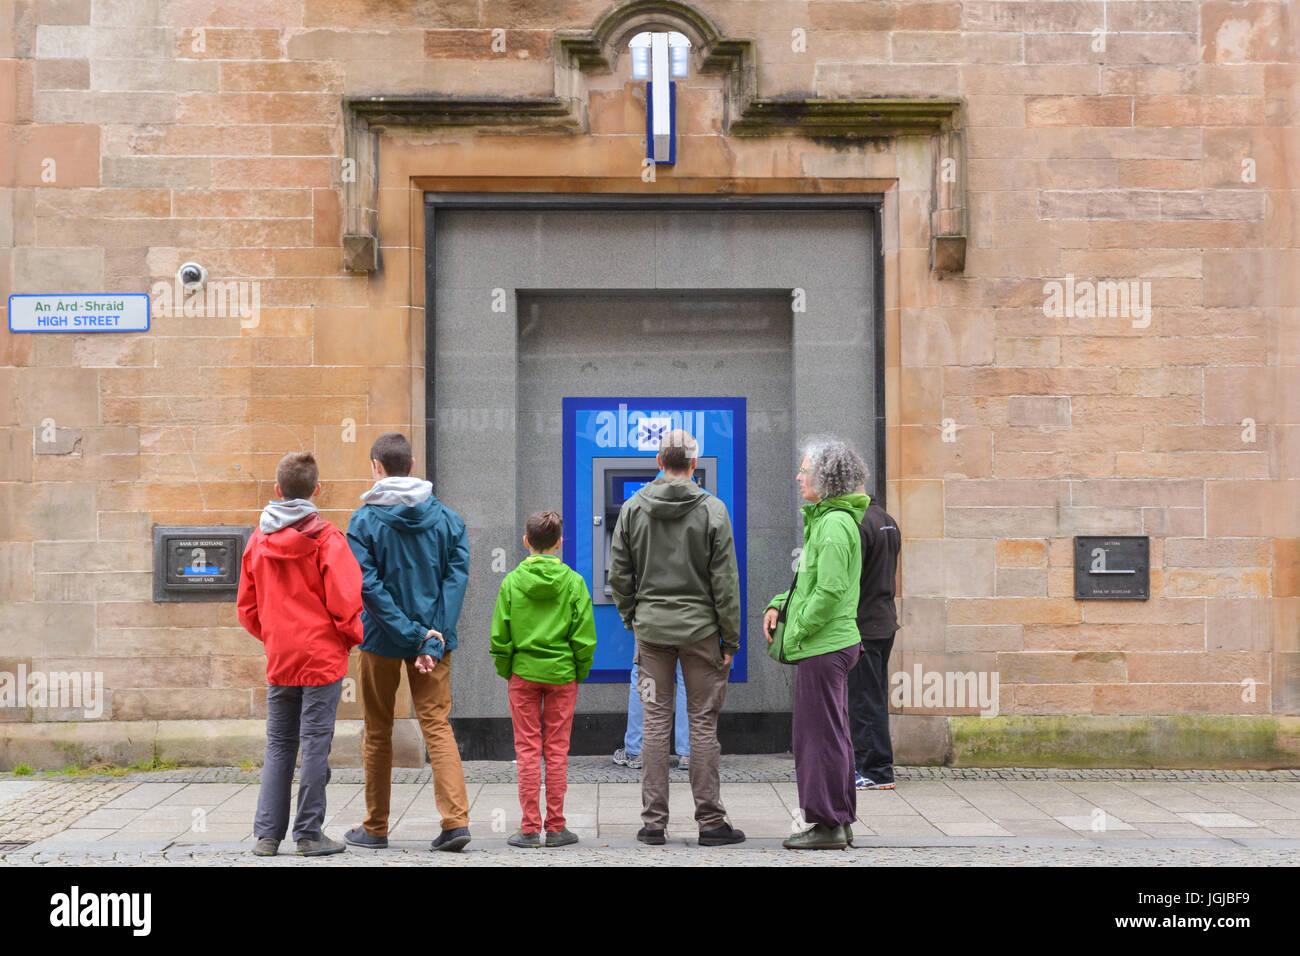 Bank of Scotland cajero dispensador, Fort William, en Escocia, Reino Unido Imagen De Stock